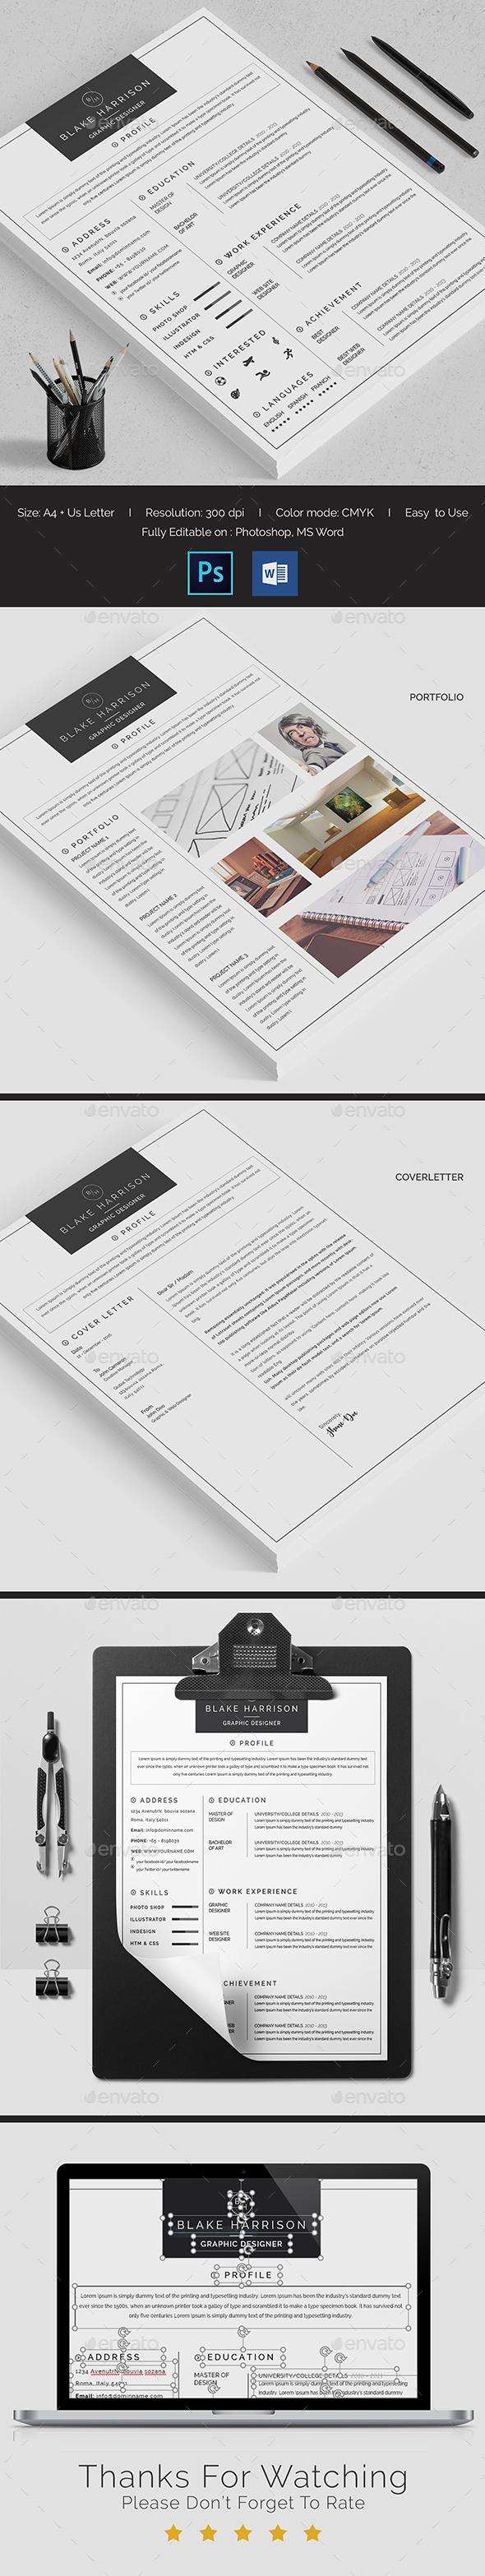 Pin de Devan Lesky en Resume Design   Pinterest